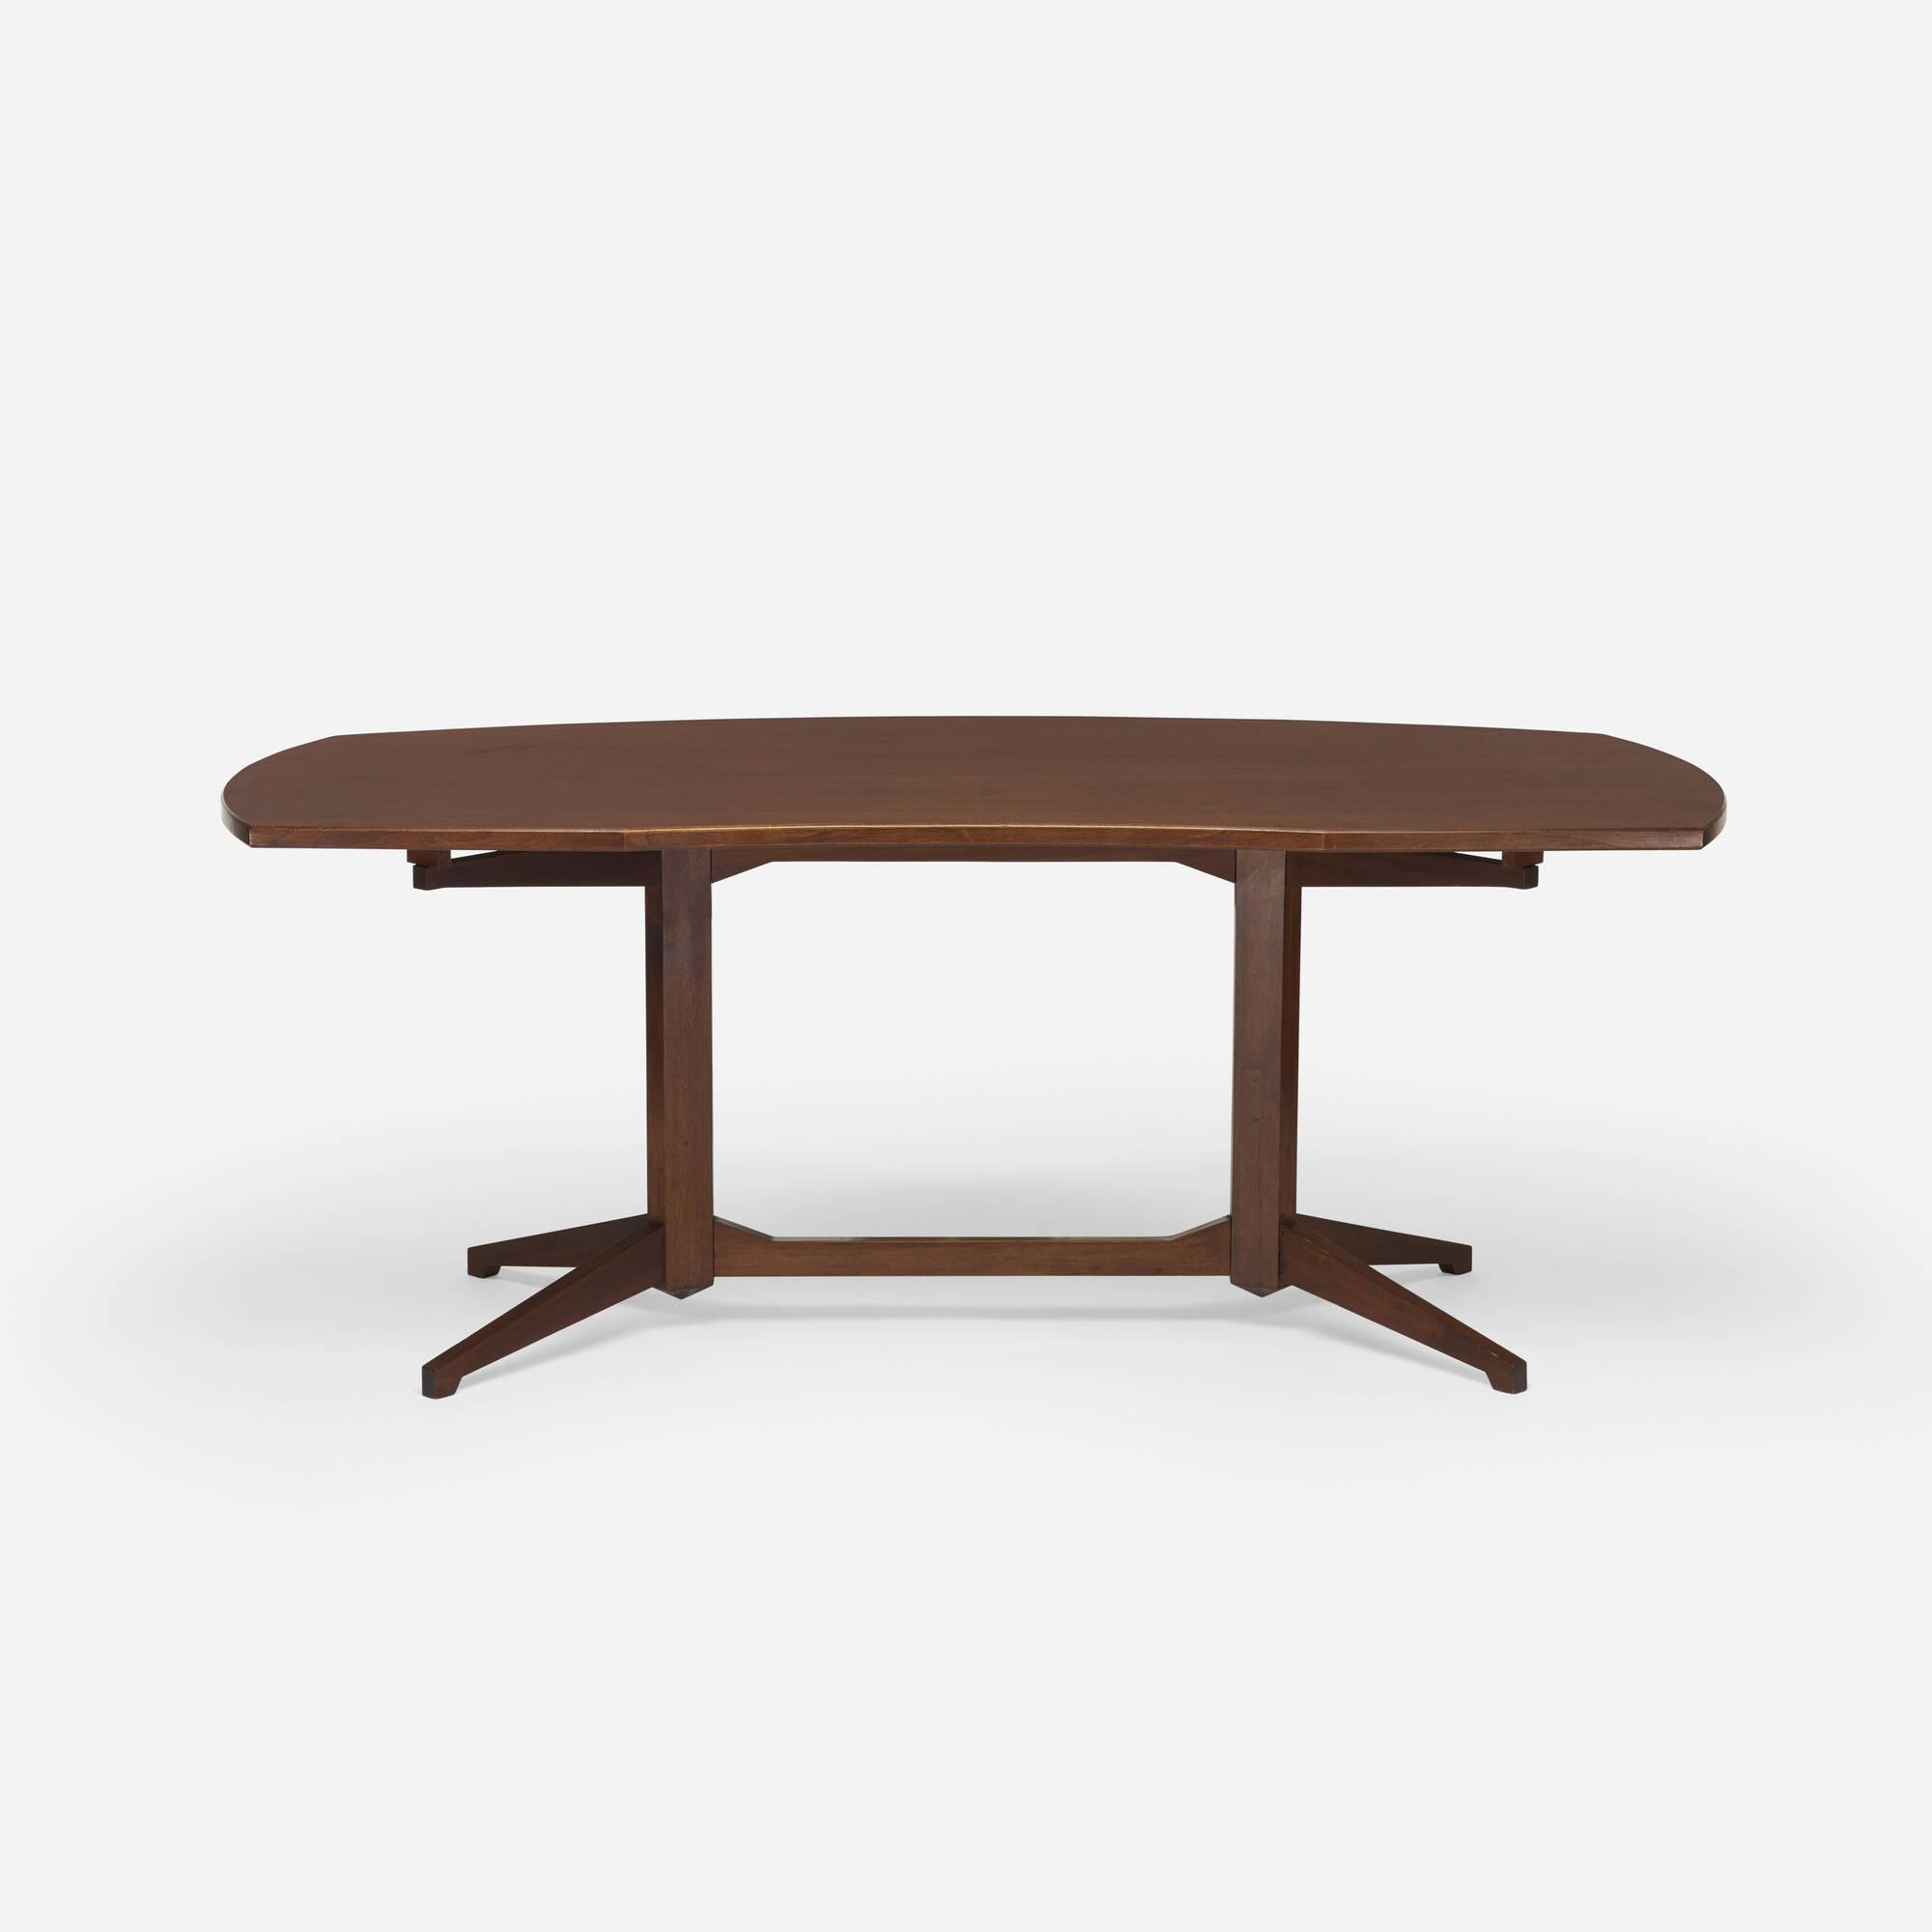 308: Franco Albini and Franca Helg / desk, model TL 22 (1 of 2)